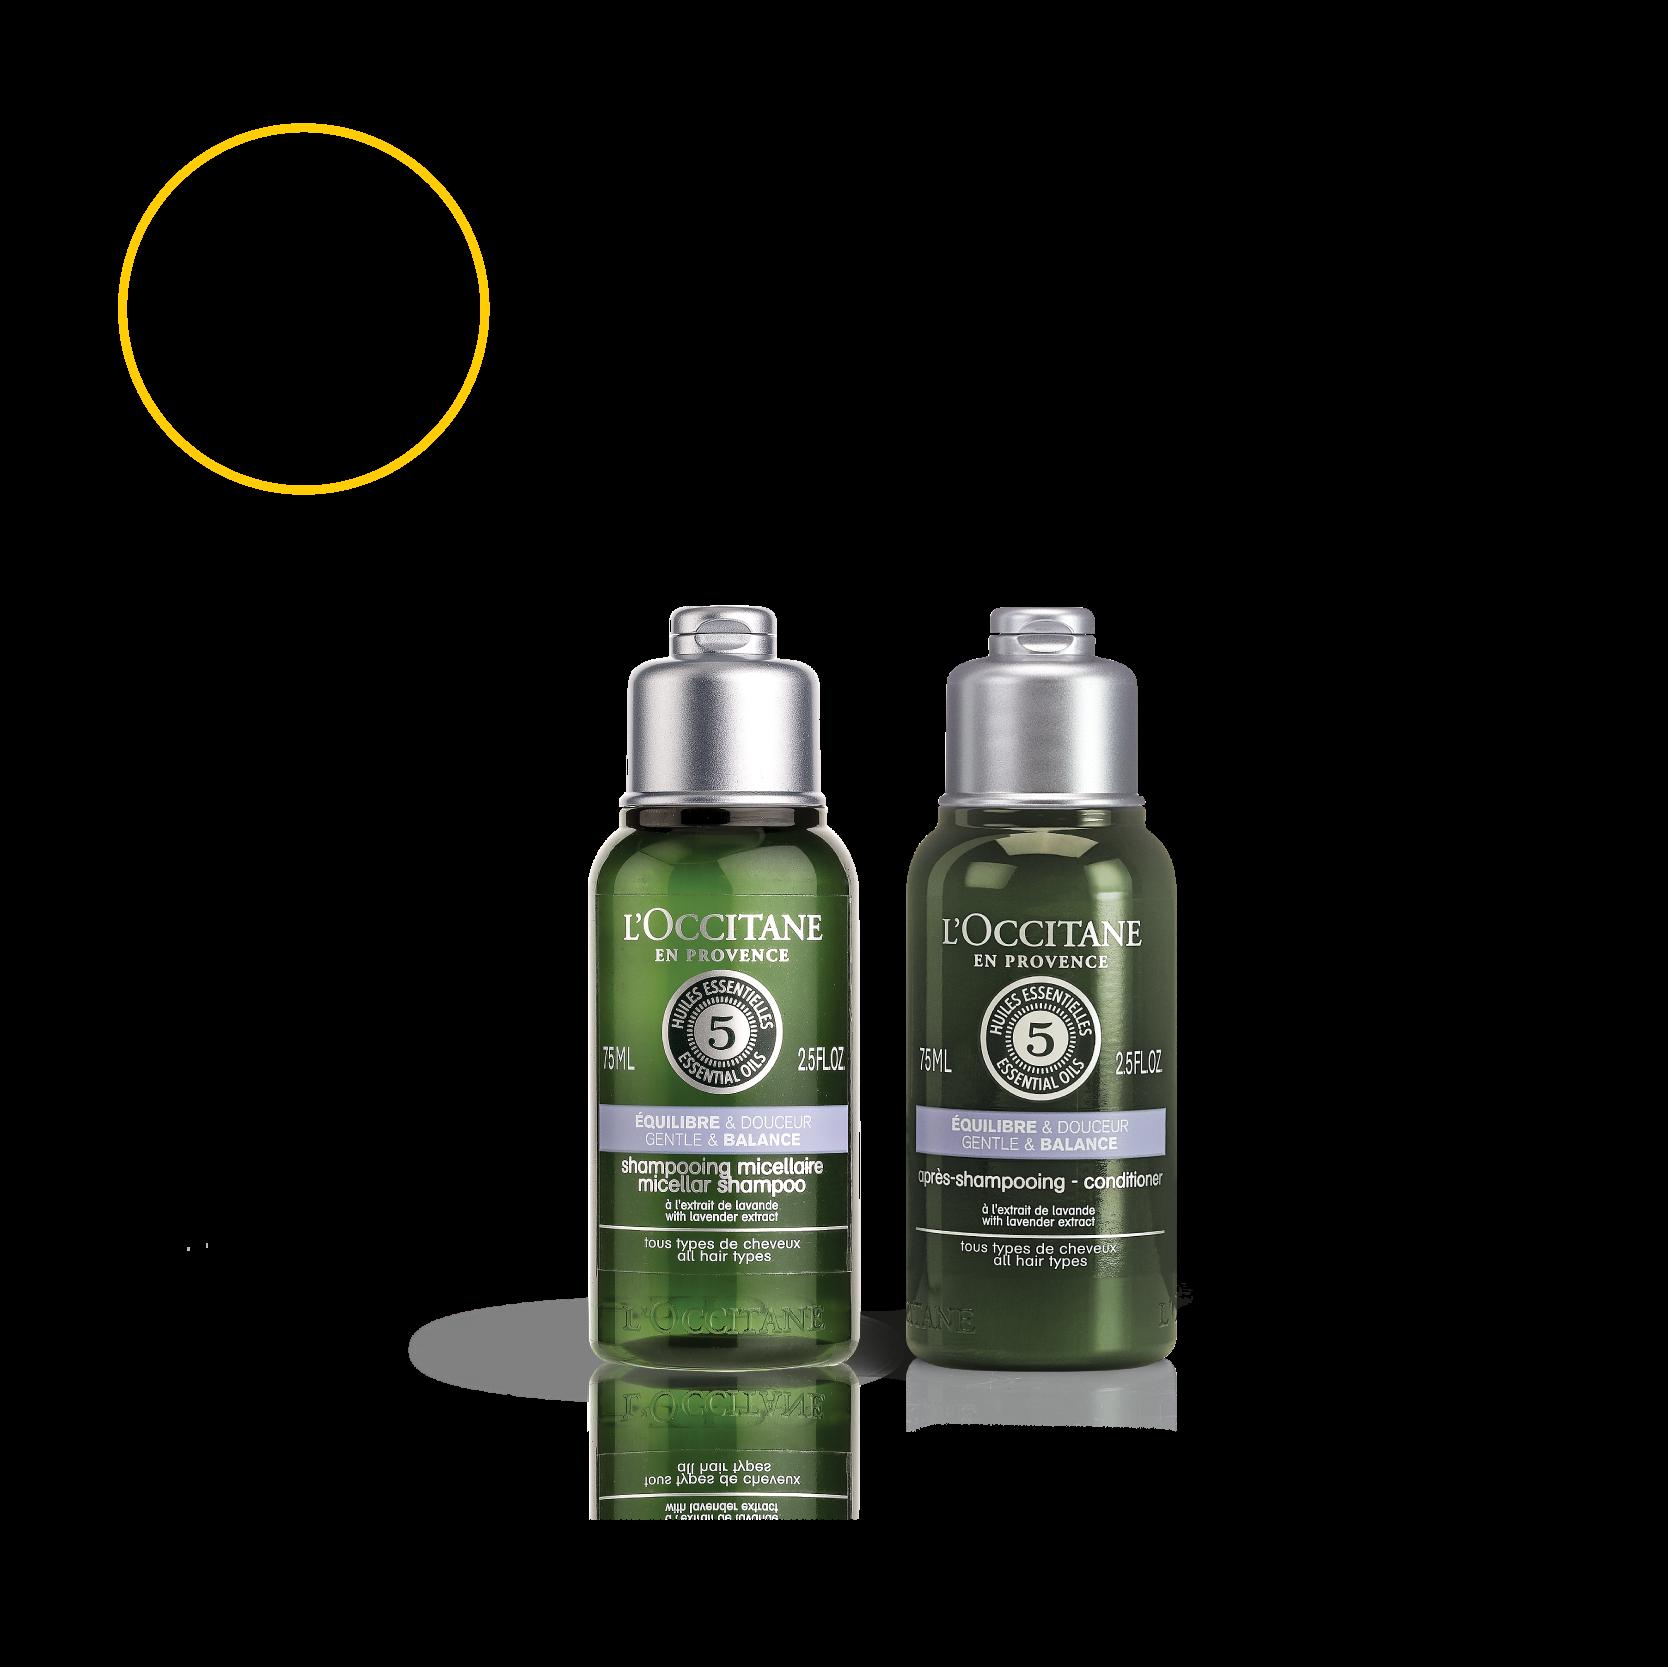 Gentle & Balance Hair Care Travel Set